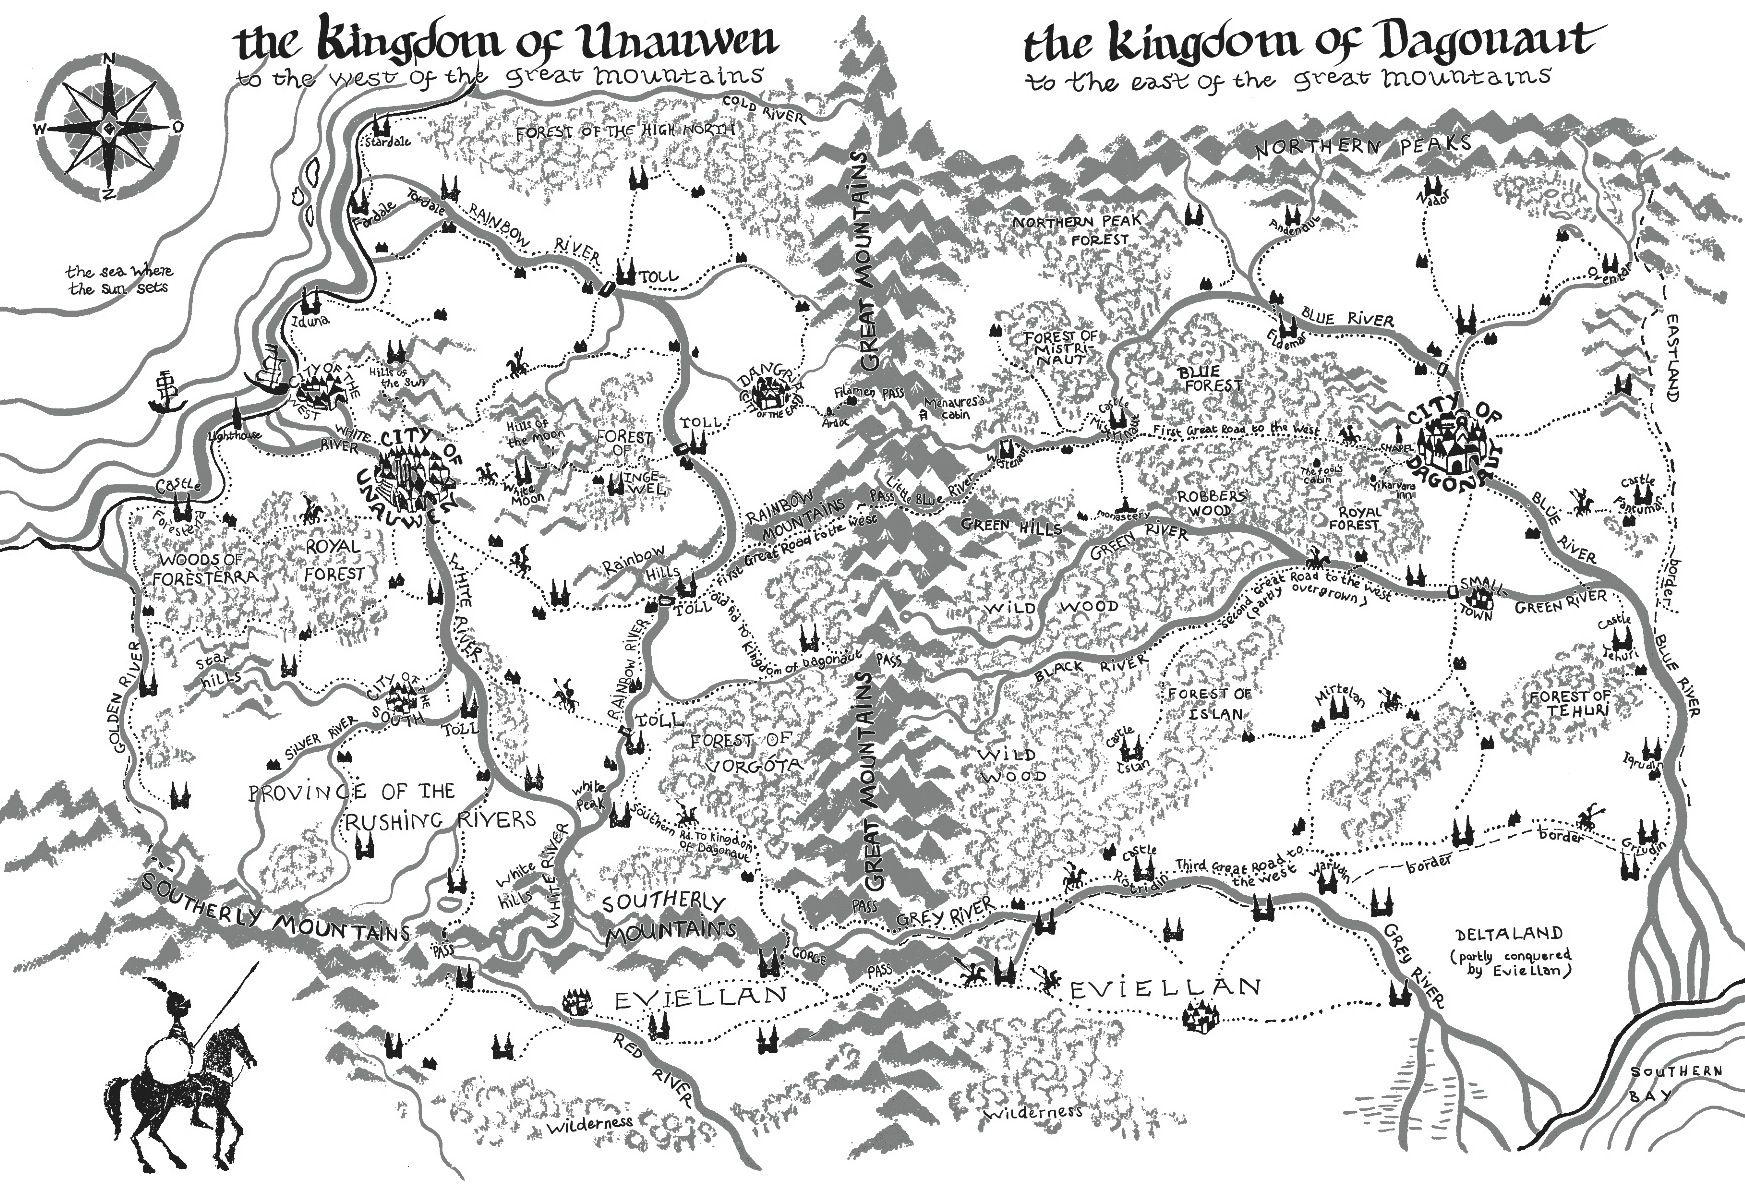 The Letter for the King 3d tekeningen, Kaarten en Boeken